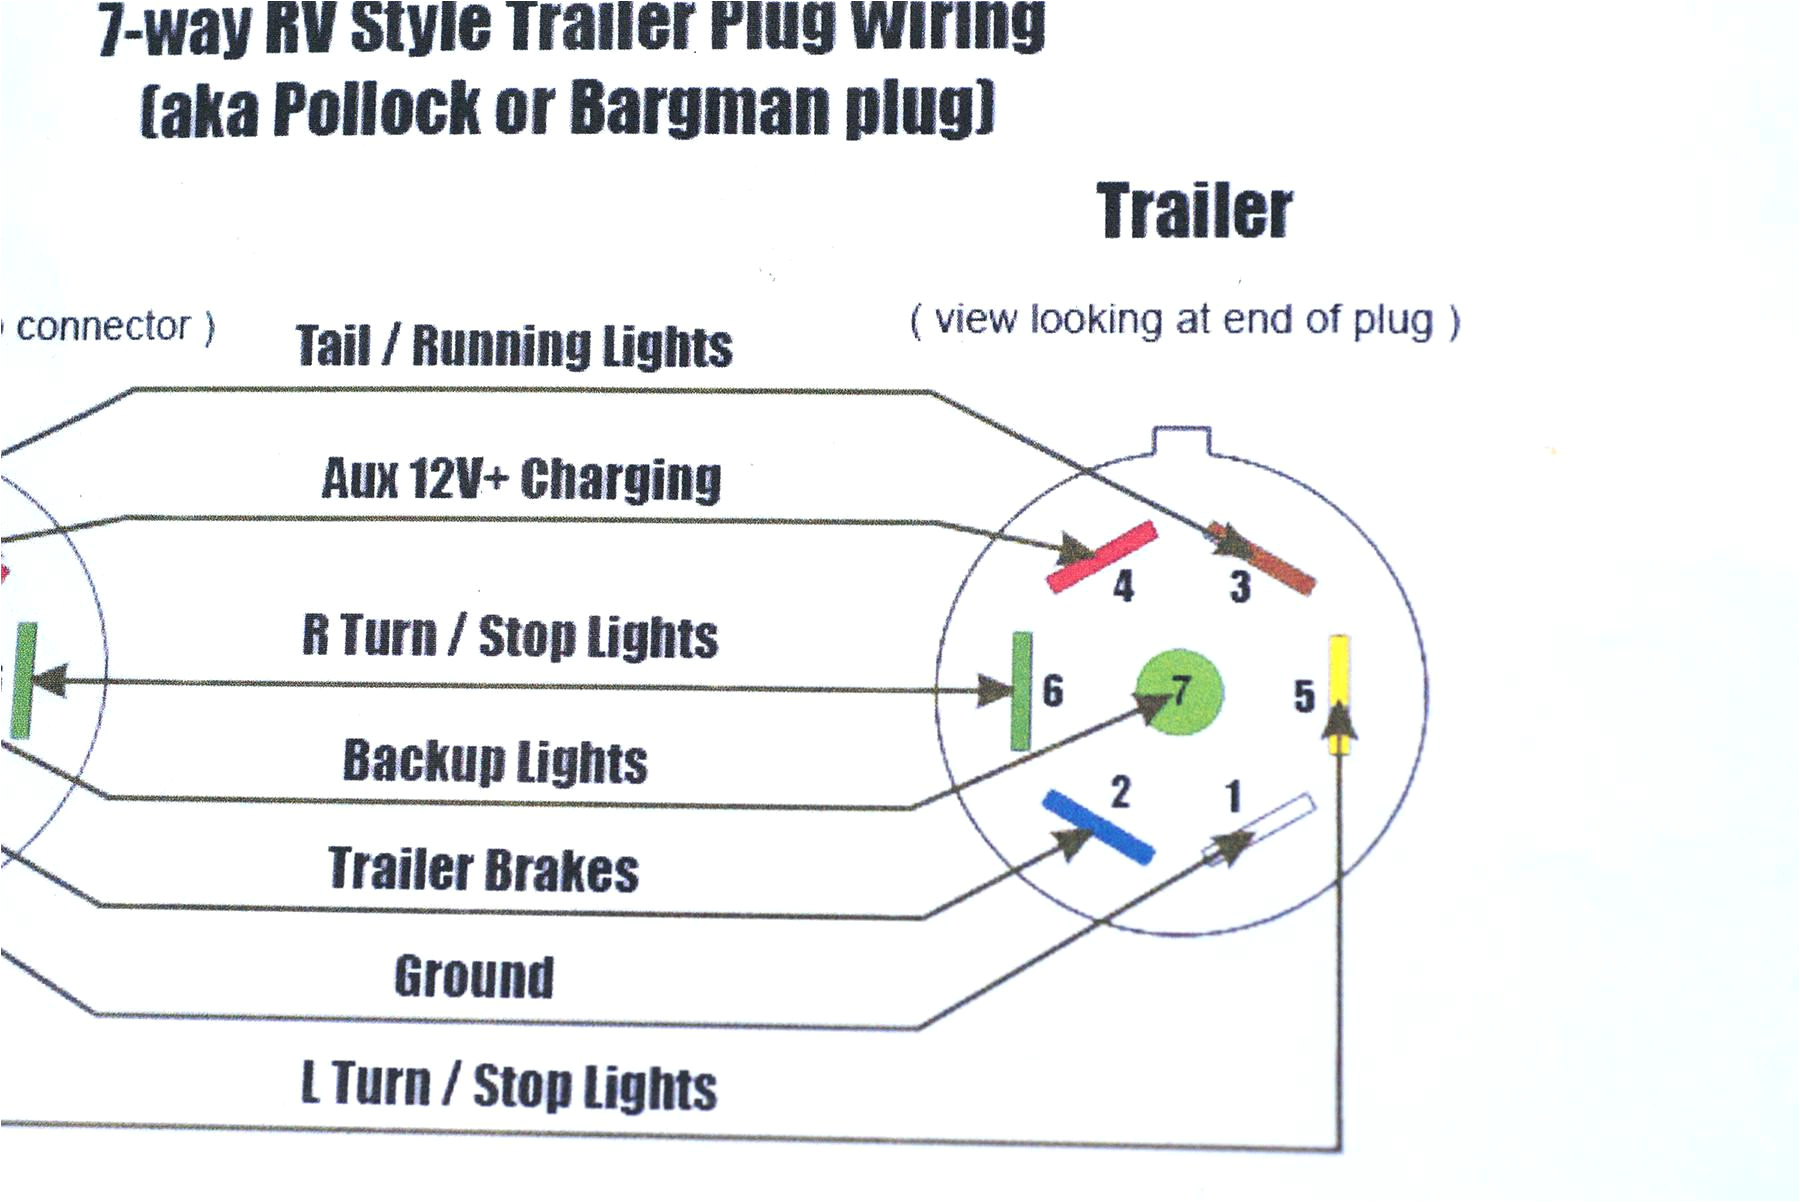 2000 chevrolet silverado 4 pin trailer wiring diagram wiring 2000 chevrolet silverado 4 pin trailer wiring diagram